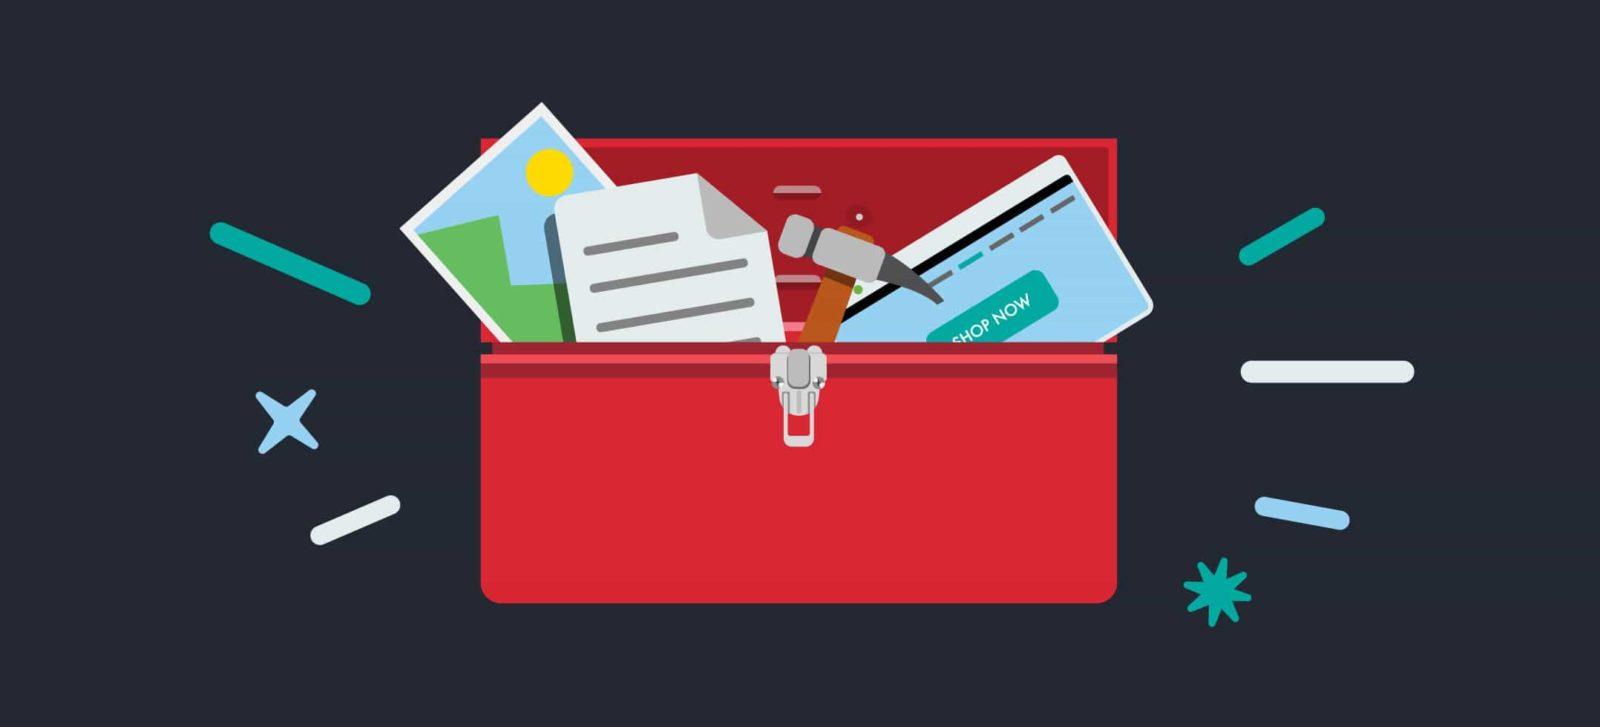 Loan broker tool in full system